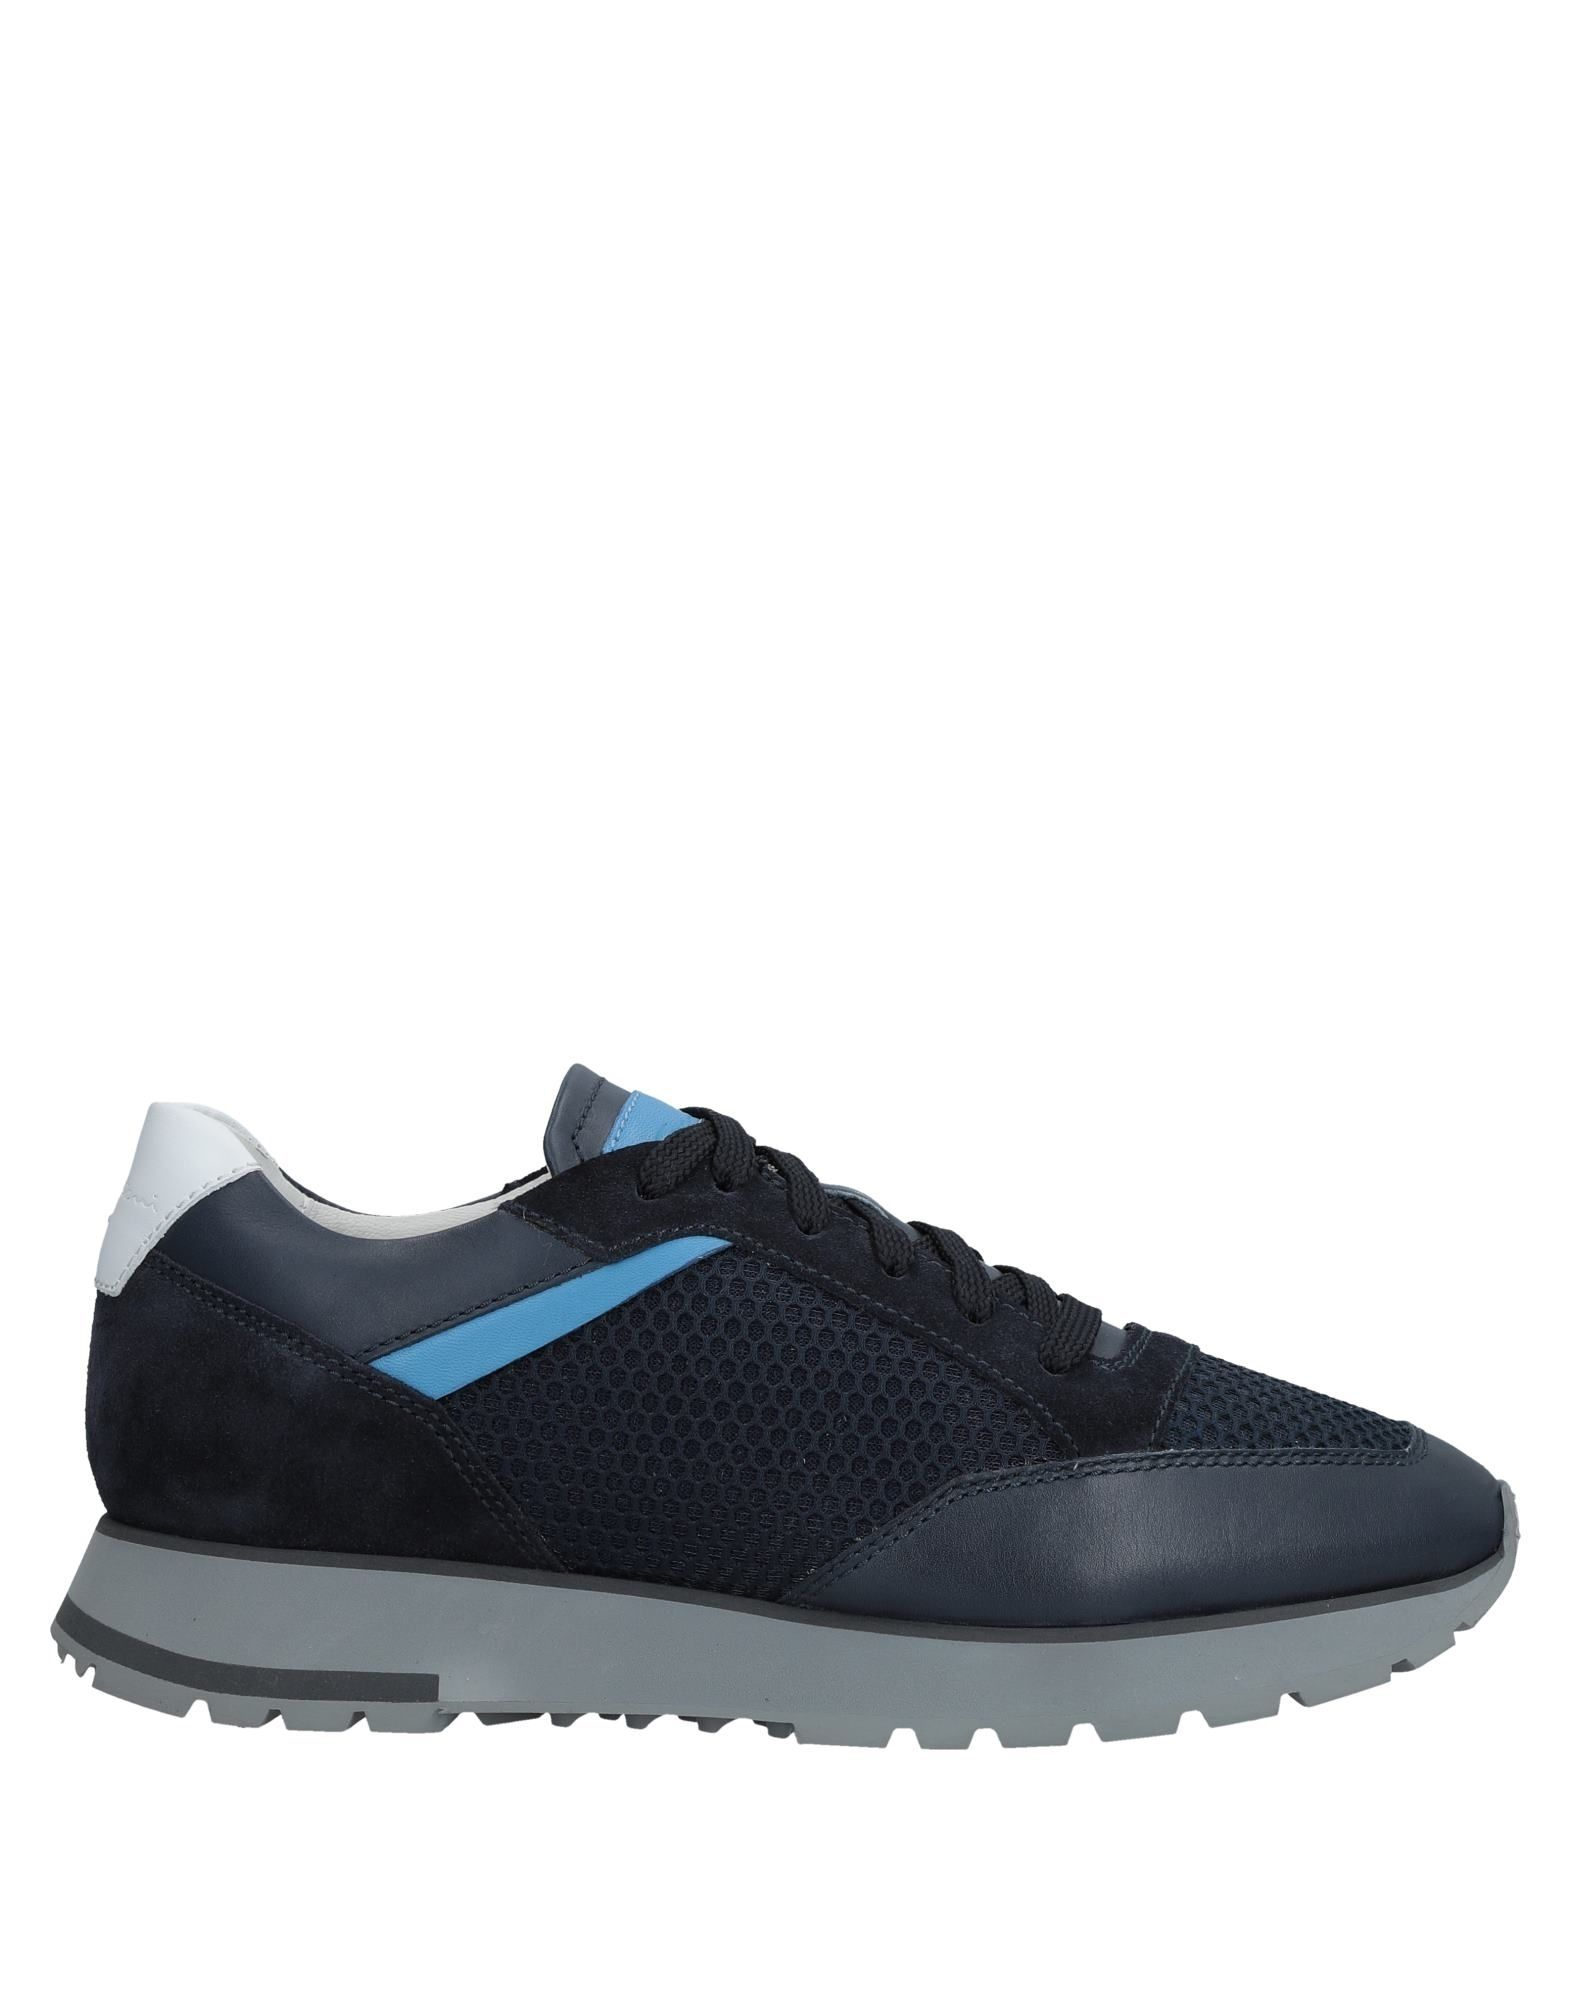 Santoni Sneakers Herren  11542511JK Gute Qualität Qualität Qualität beliebte Schuhe 9a2ec6